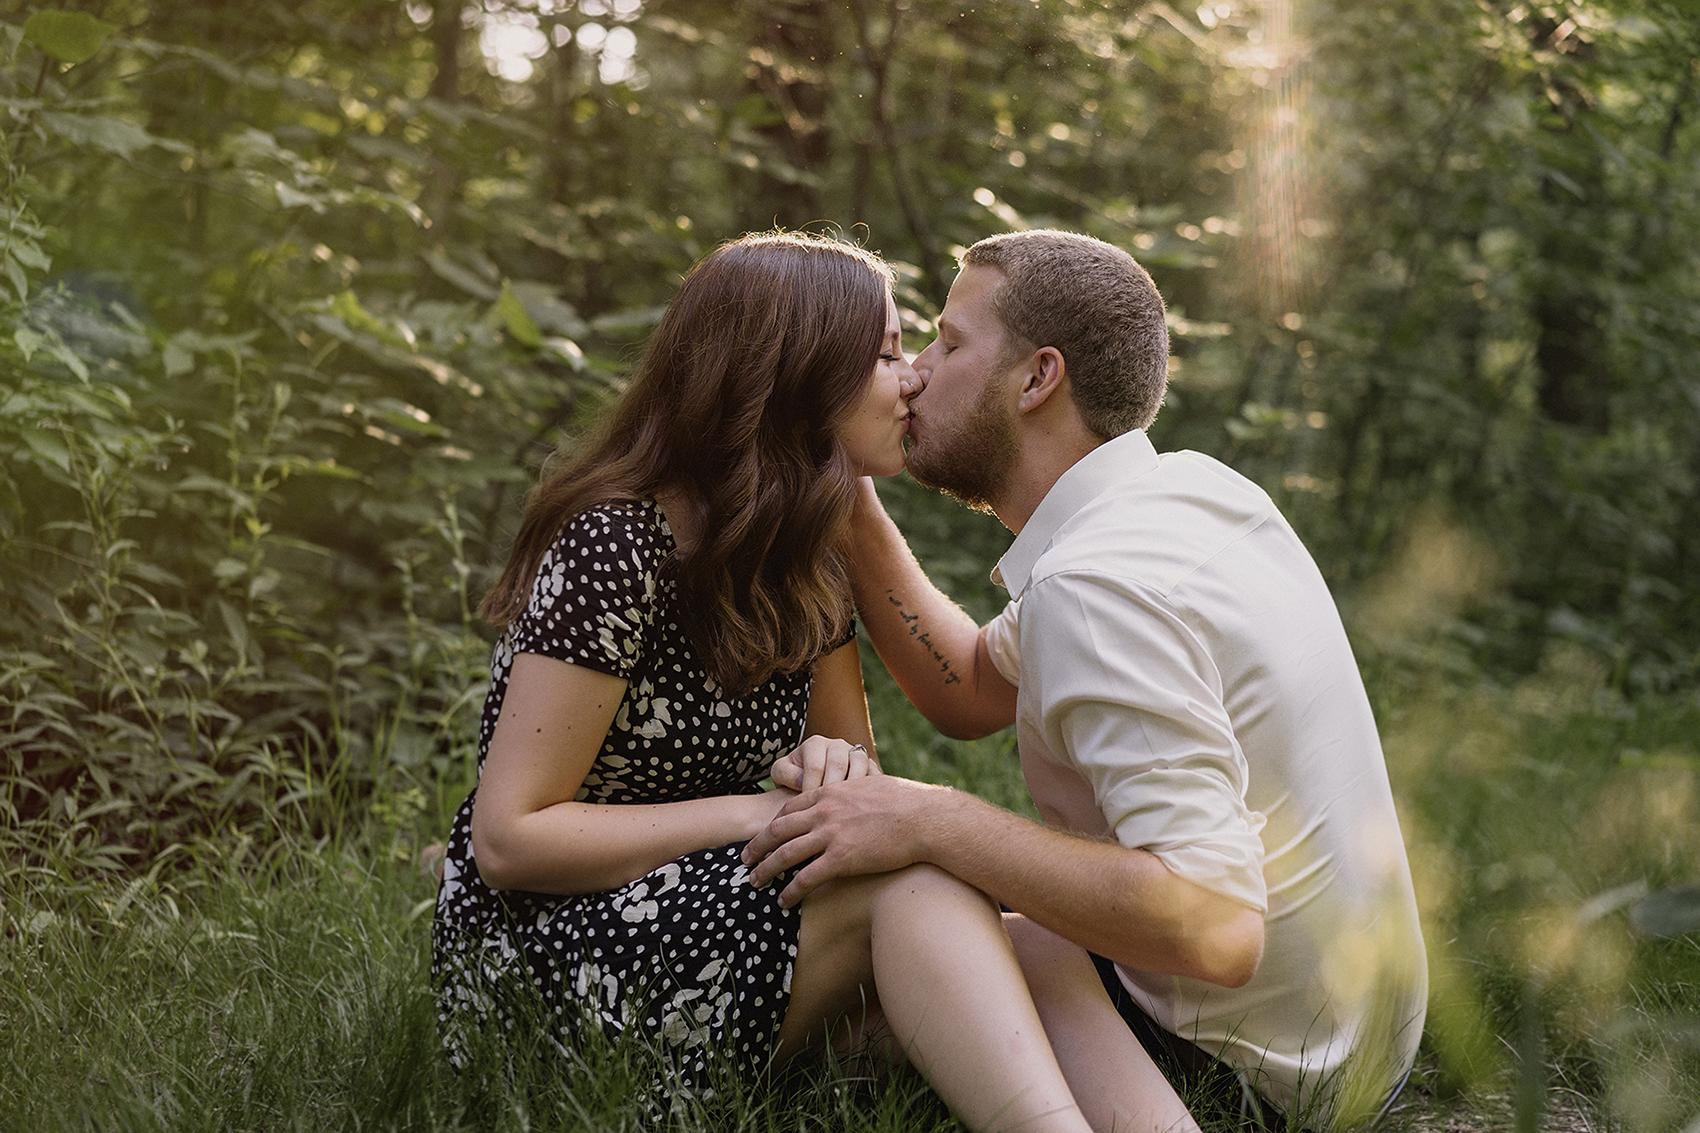 Mike_Mendez_Photography_Wedding_Engagements_1